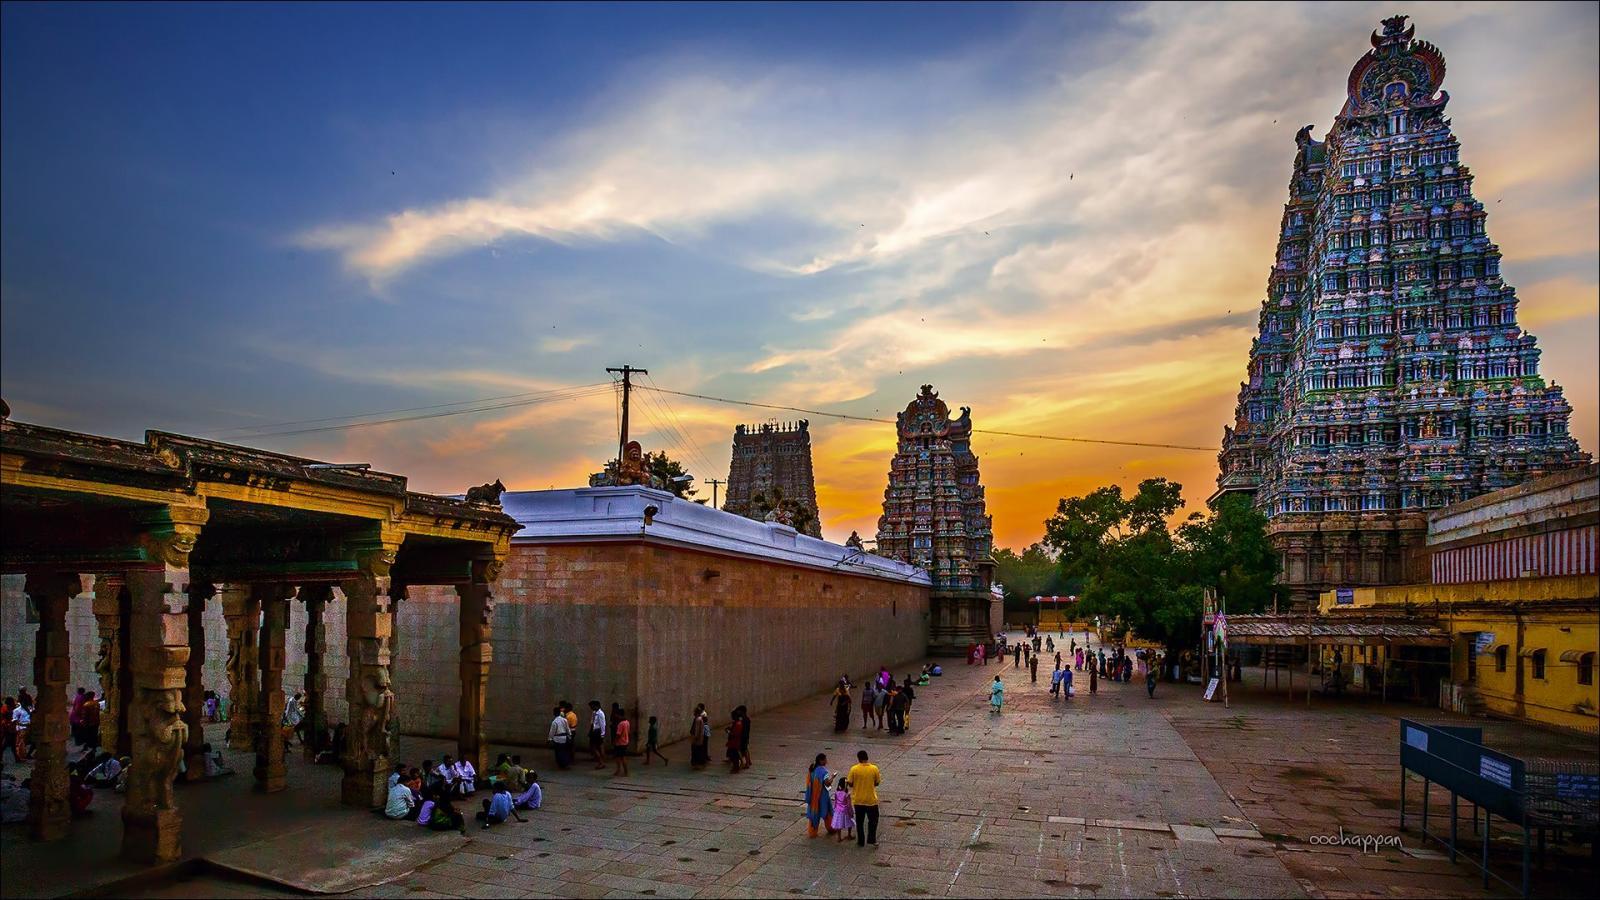 Pictures of Madurai Meenakshi Amman Temple